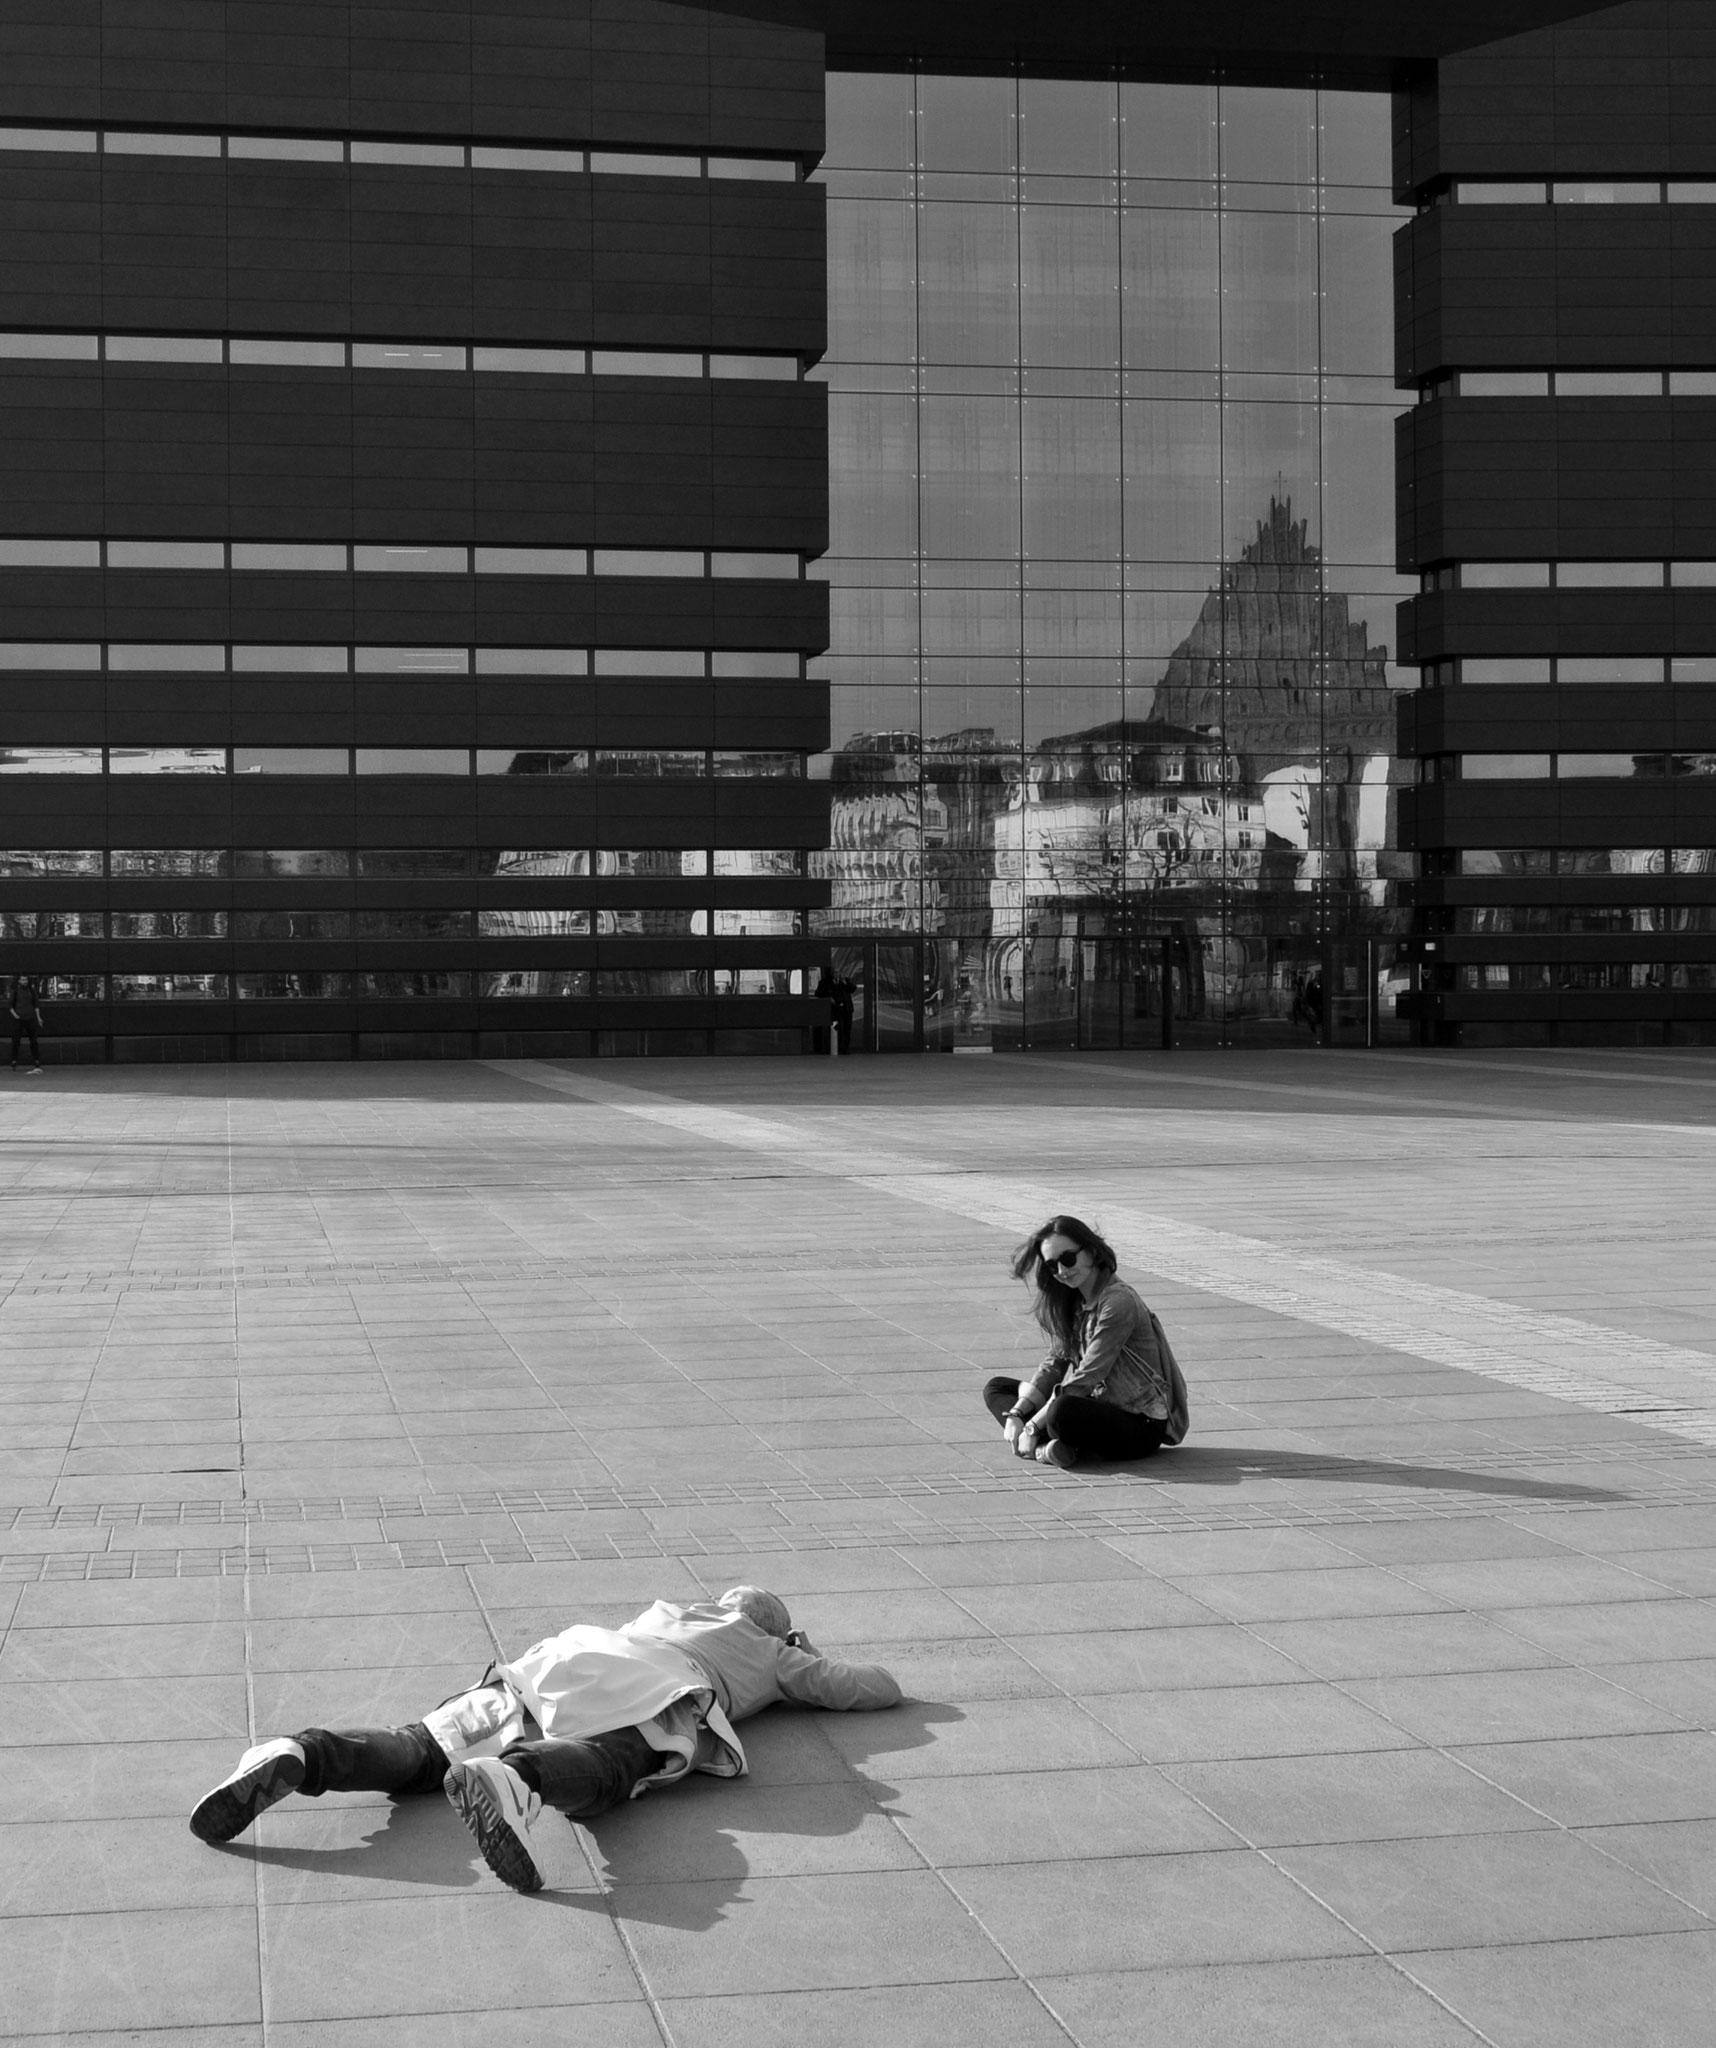 Der liegende Fotograf